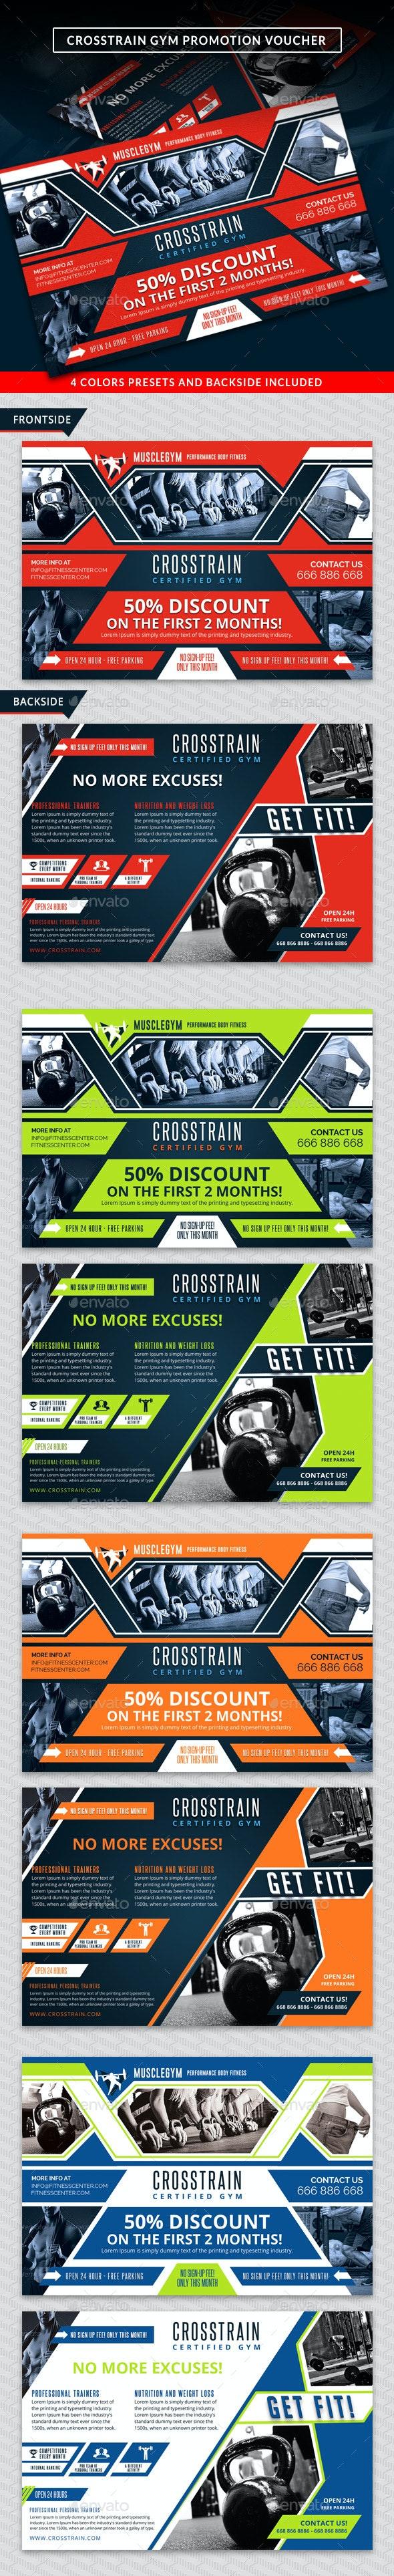 Cross Training Gym Promotion Discount Voucher - Cards & Invites Print Templates